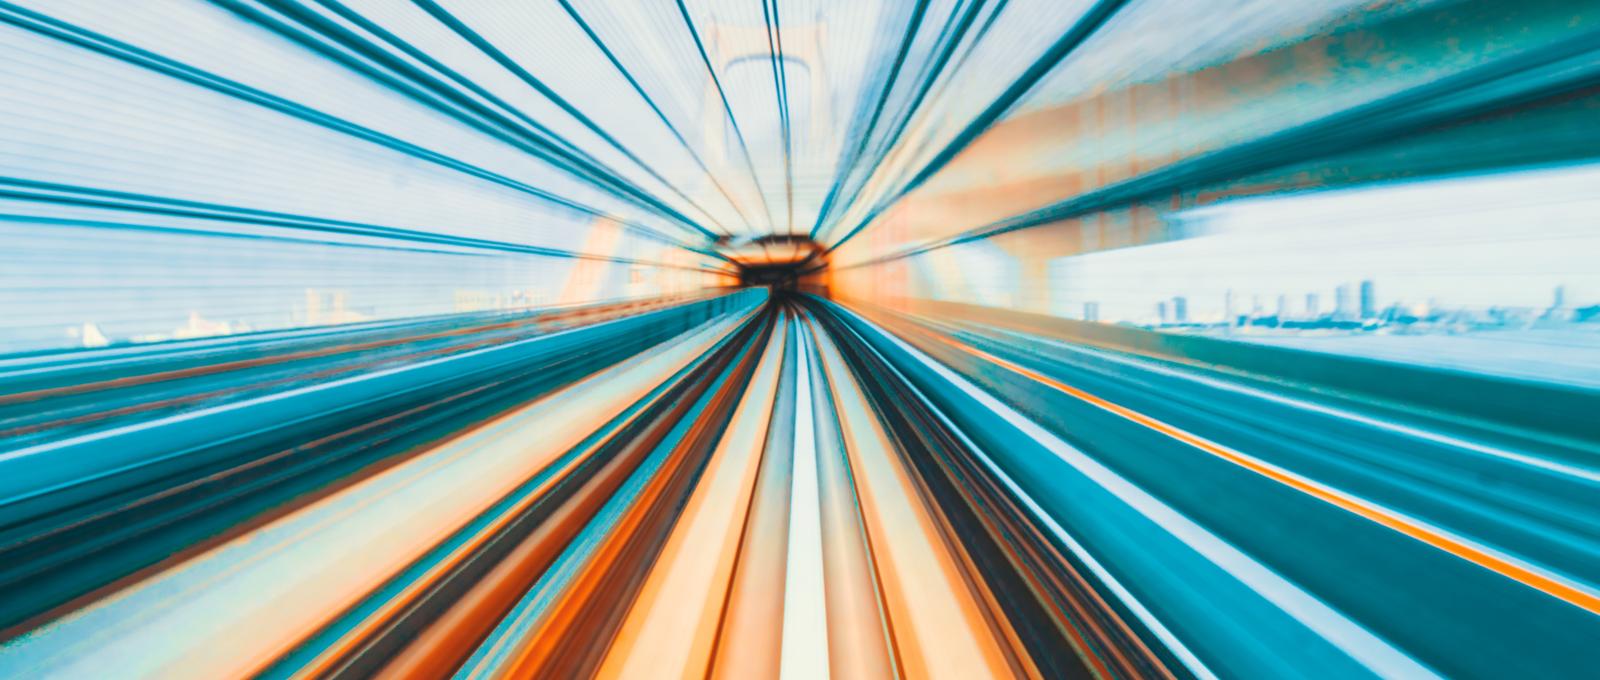 Prysmian Group insieme a Hardt Hyperloop per accelerare l'Open Innovation